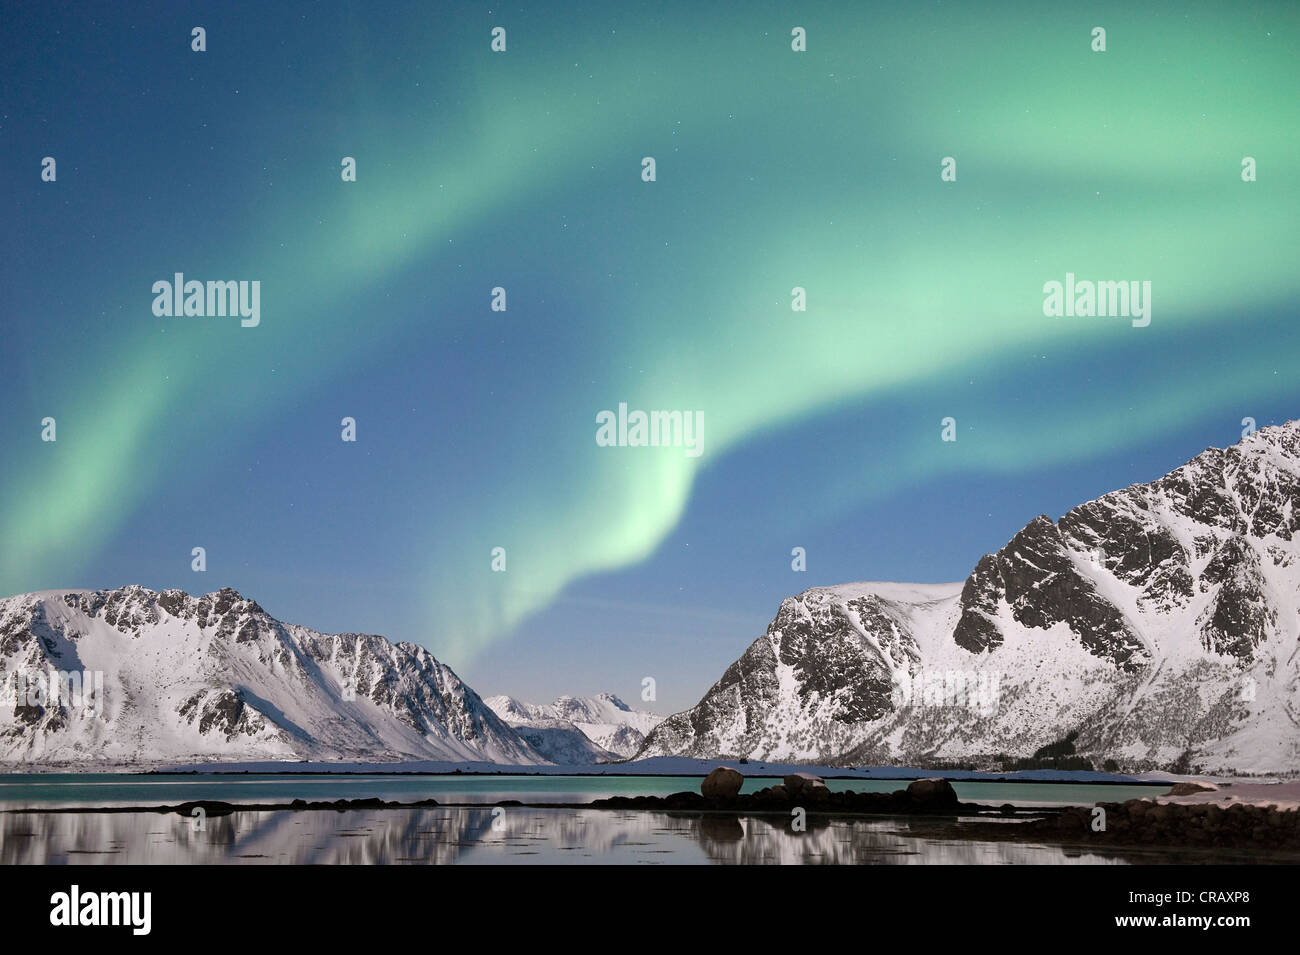 Northern Lights, aurora borealis, vu de Lyngvaerstranda sur l'île d'Austvågøya, surplombant le Fjord Gimsøystraumen Banque D'Images